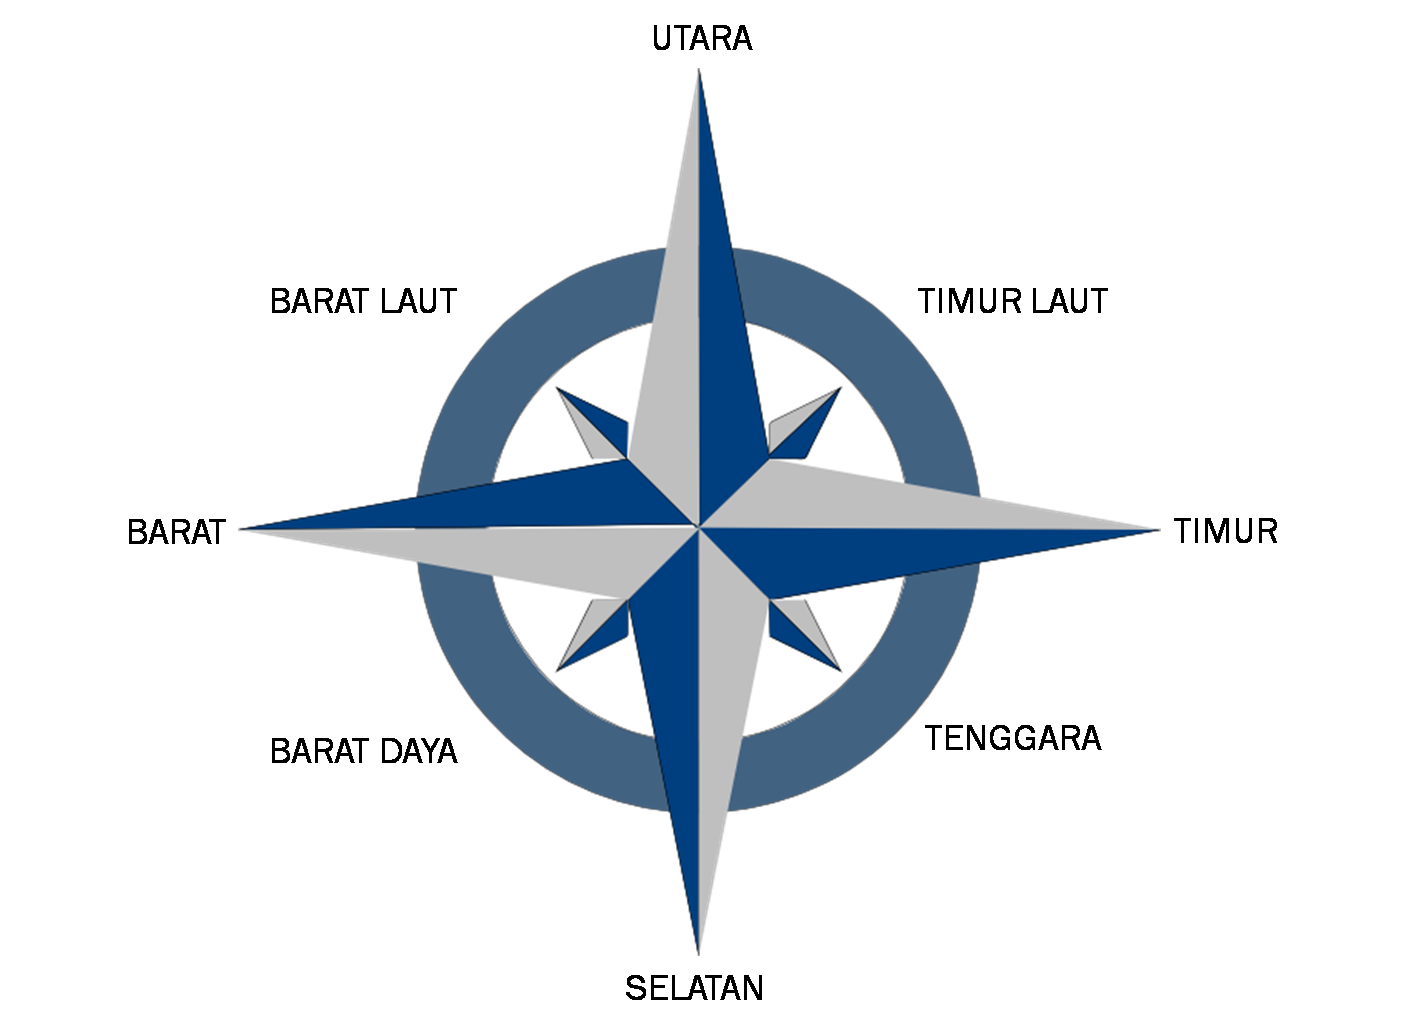 Gambar 8 Arah Mata Angin Dan Kompas Freewaremini Logos